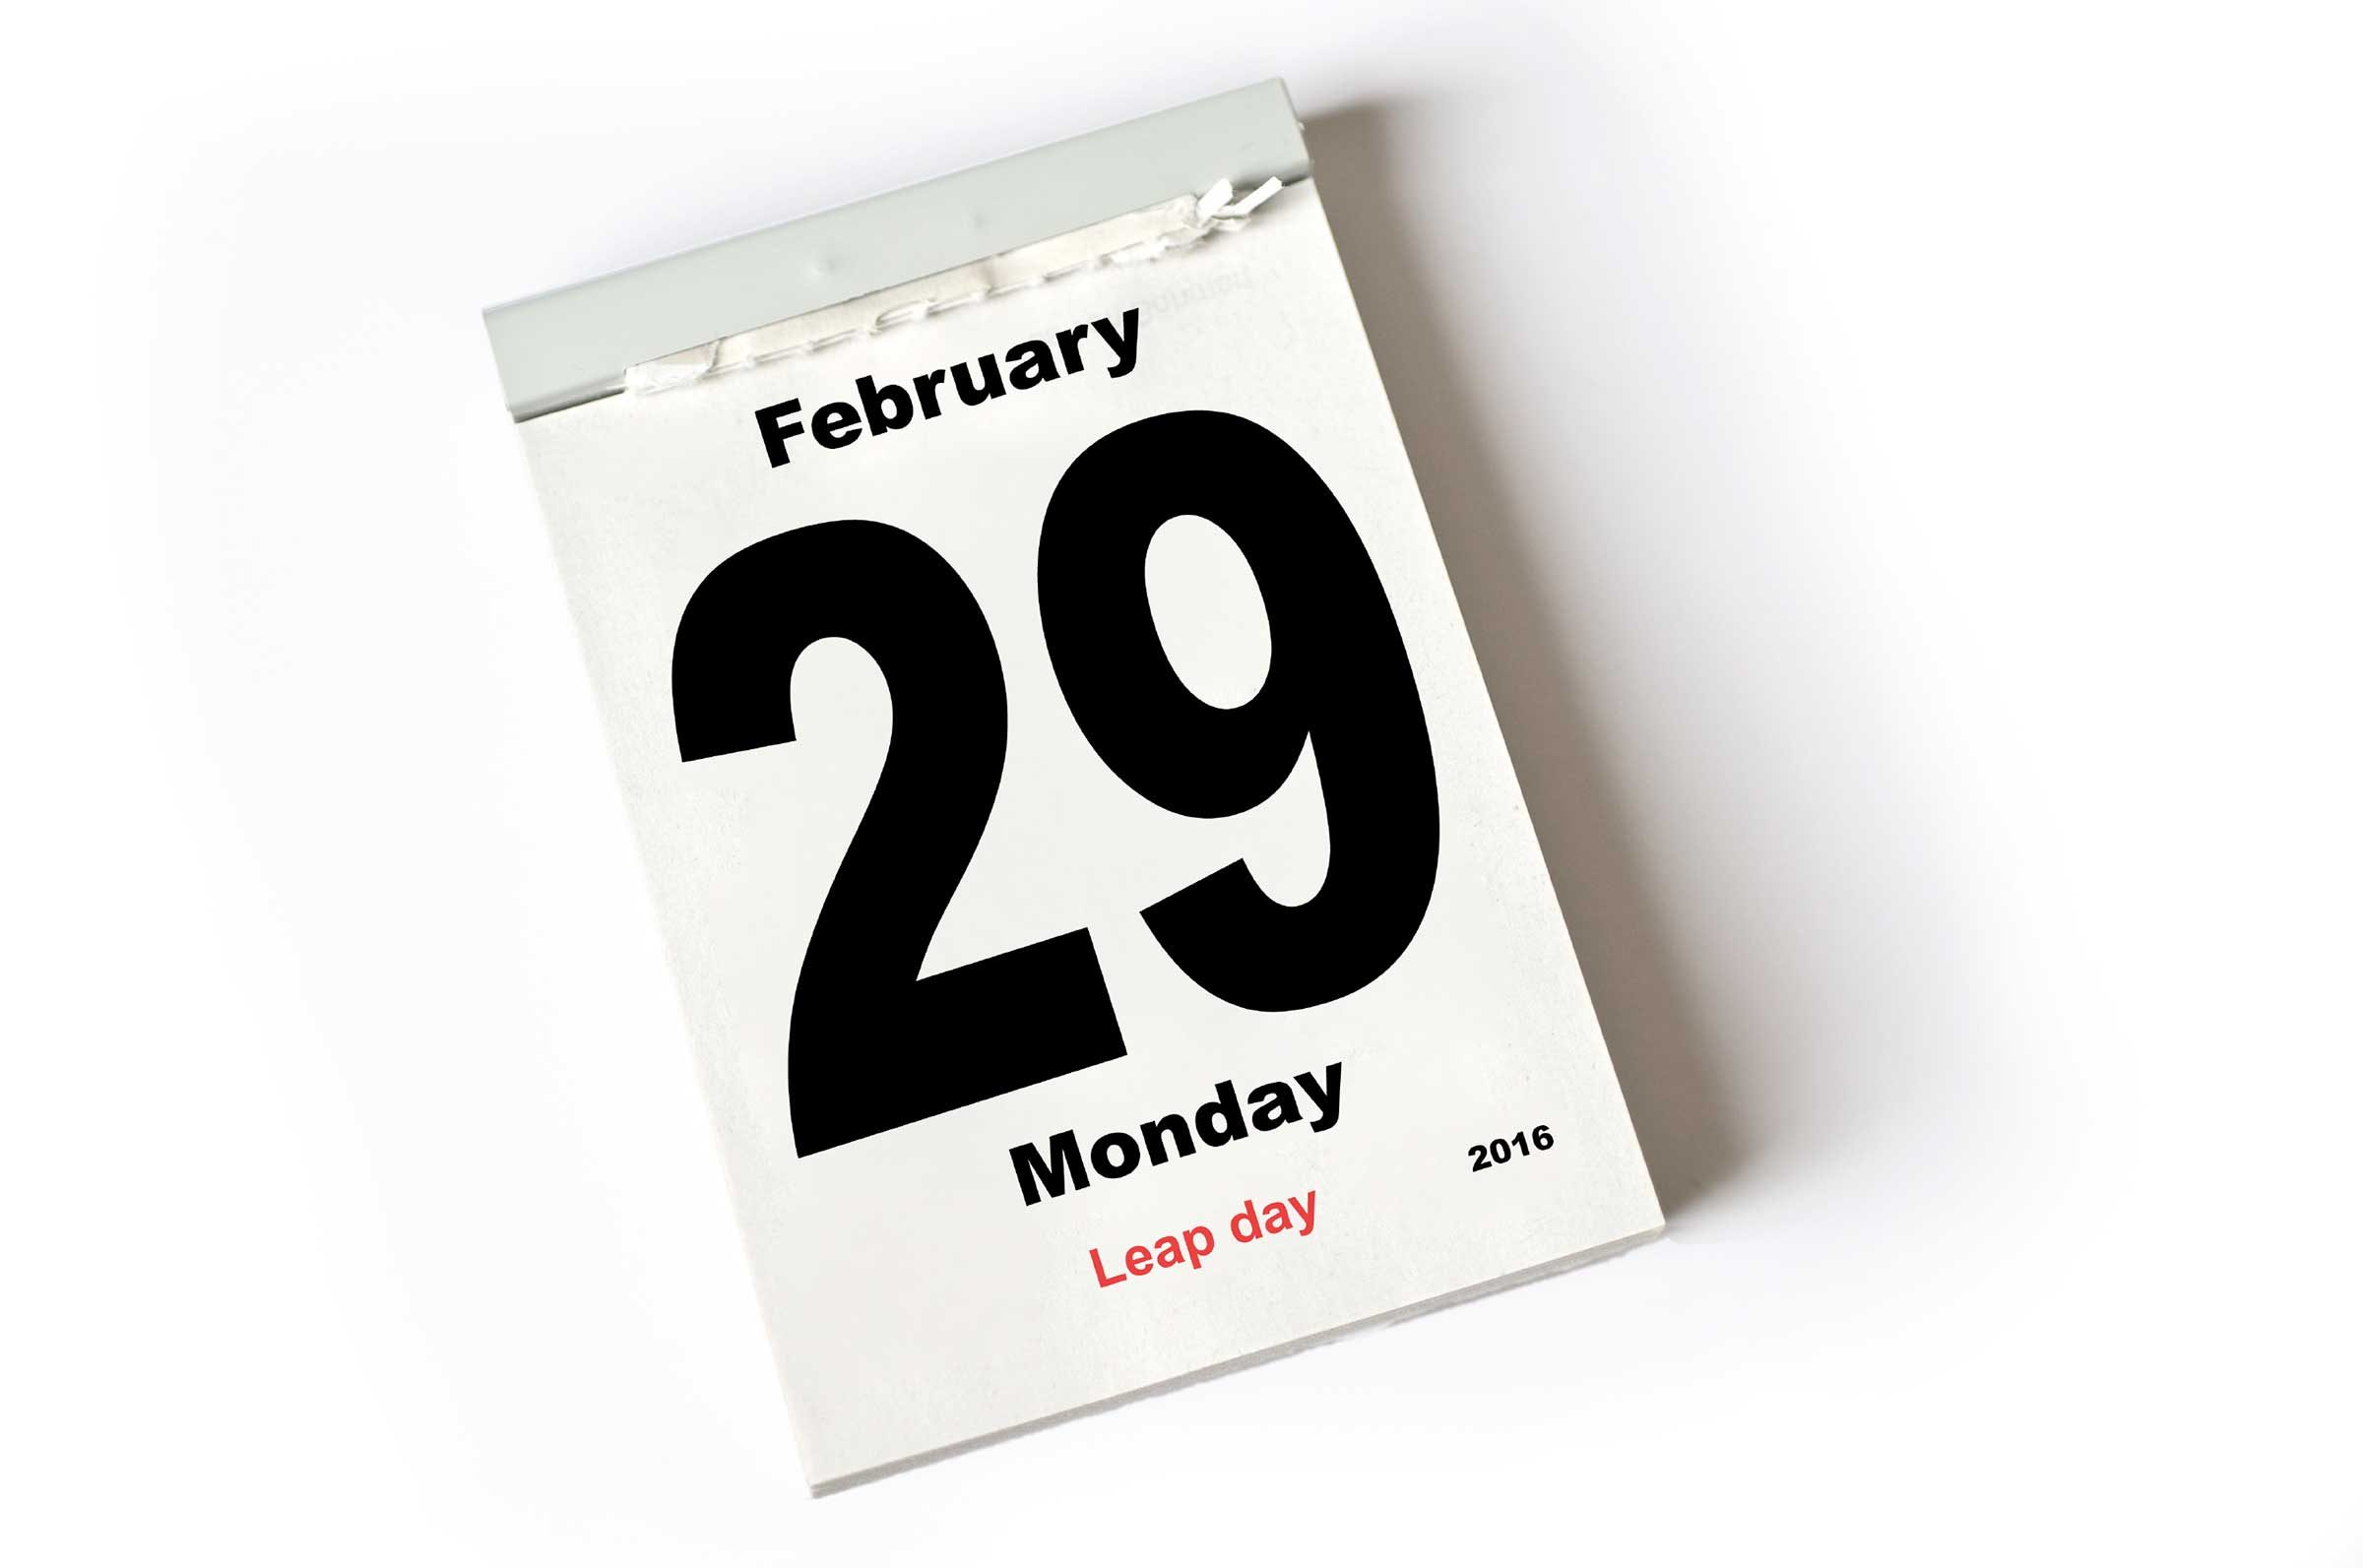 Julian Leap Year Calendar : Bizarre leap year facts about february 29 readers digest